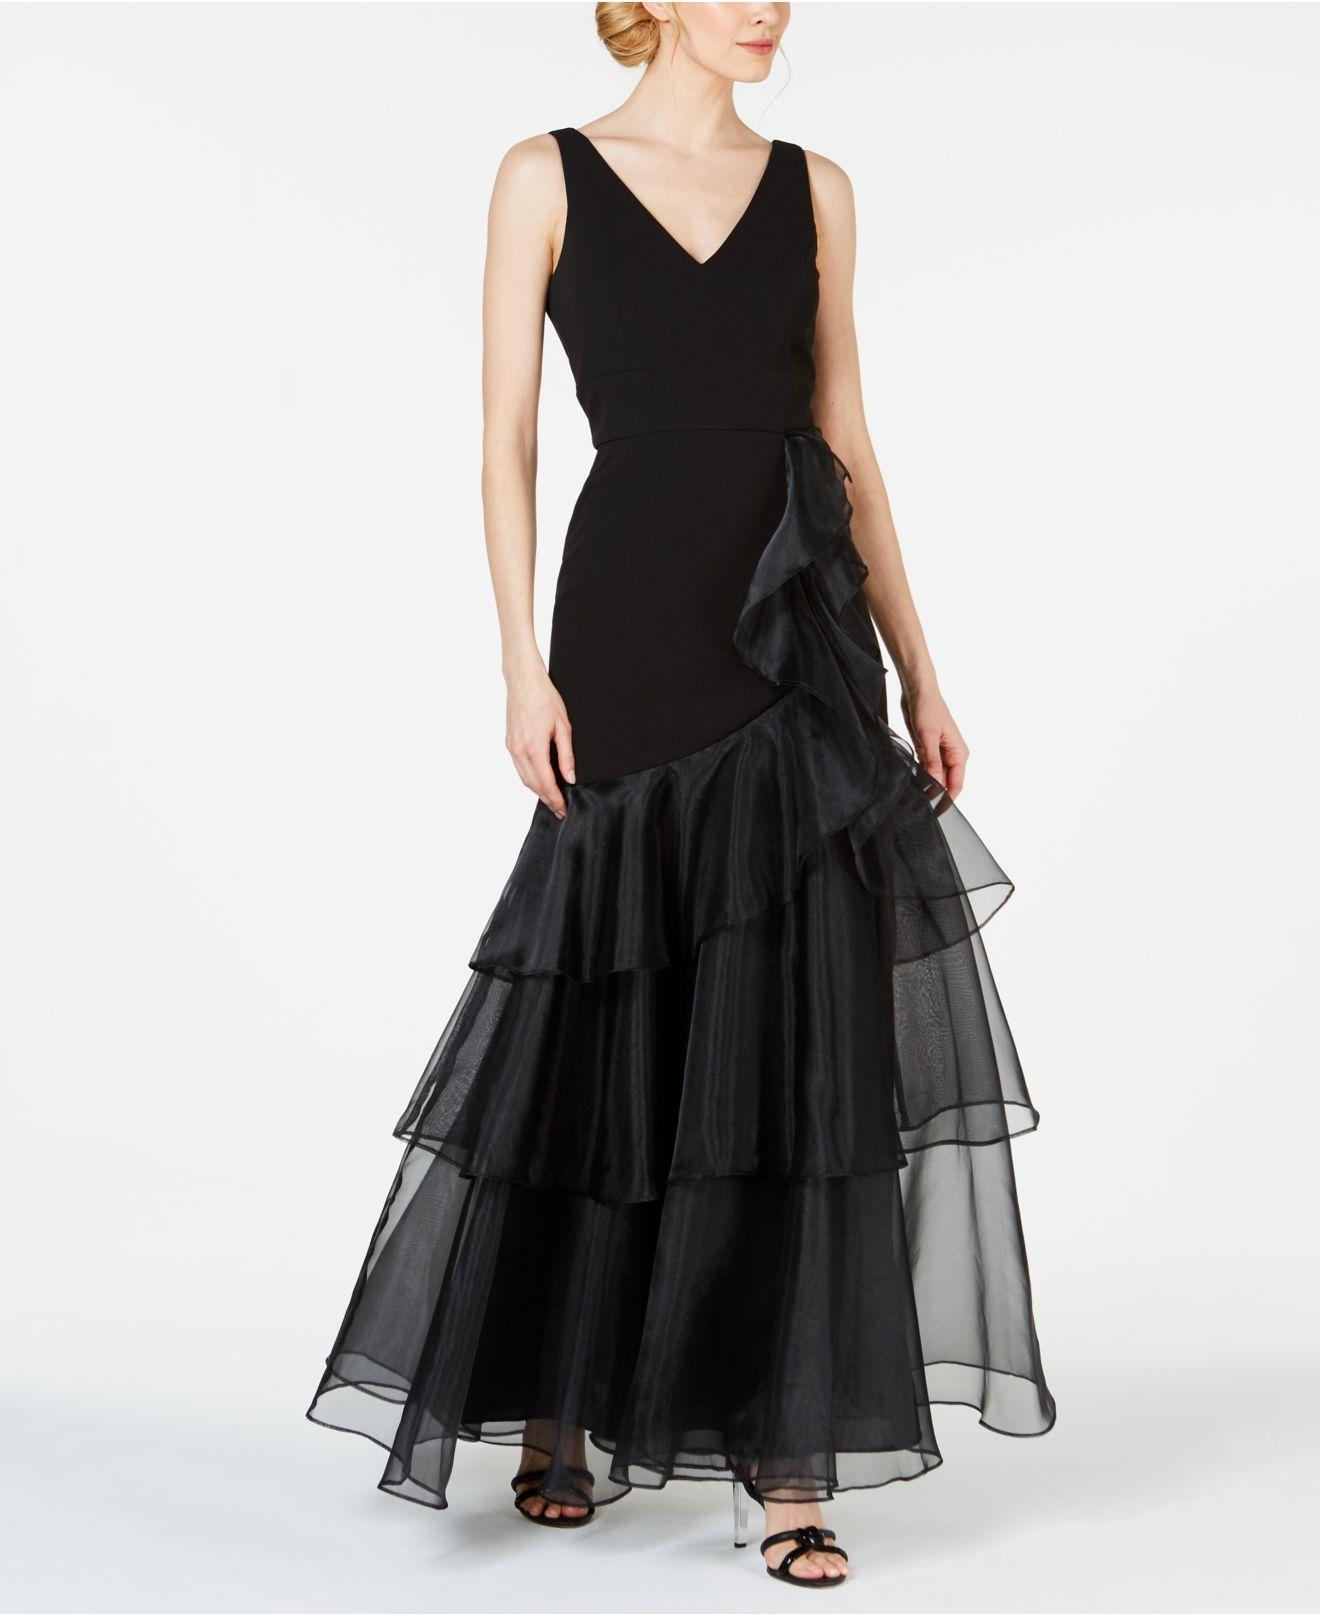 b7515f48bd85 Lyst - Calvin Klein V-neck Organza Ruffle Gown in Black